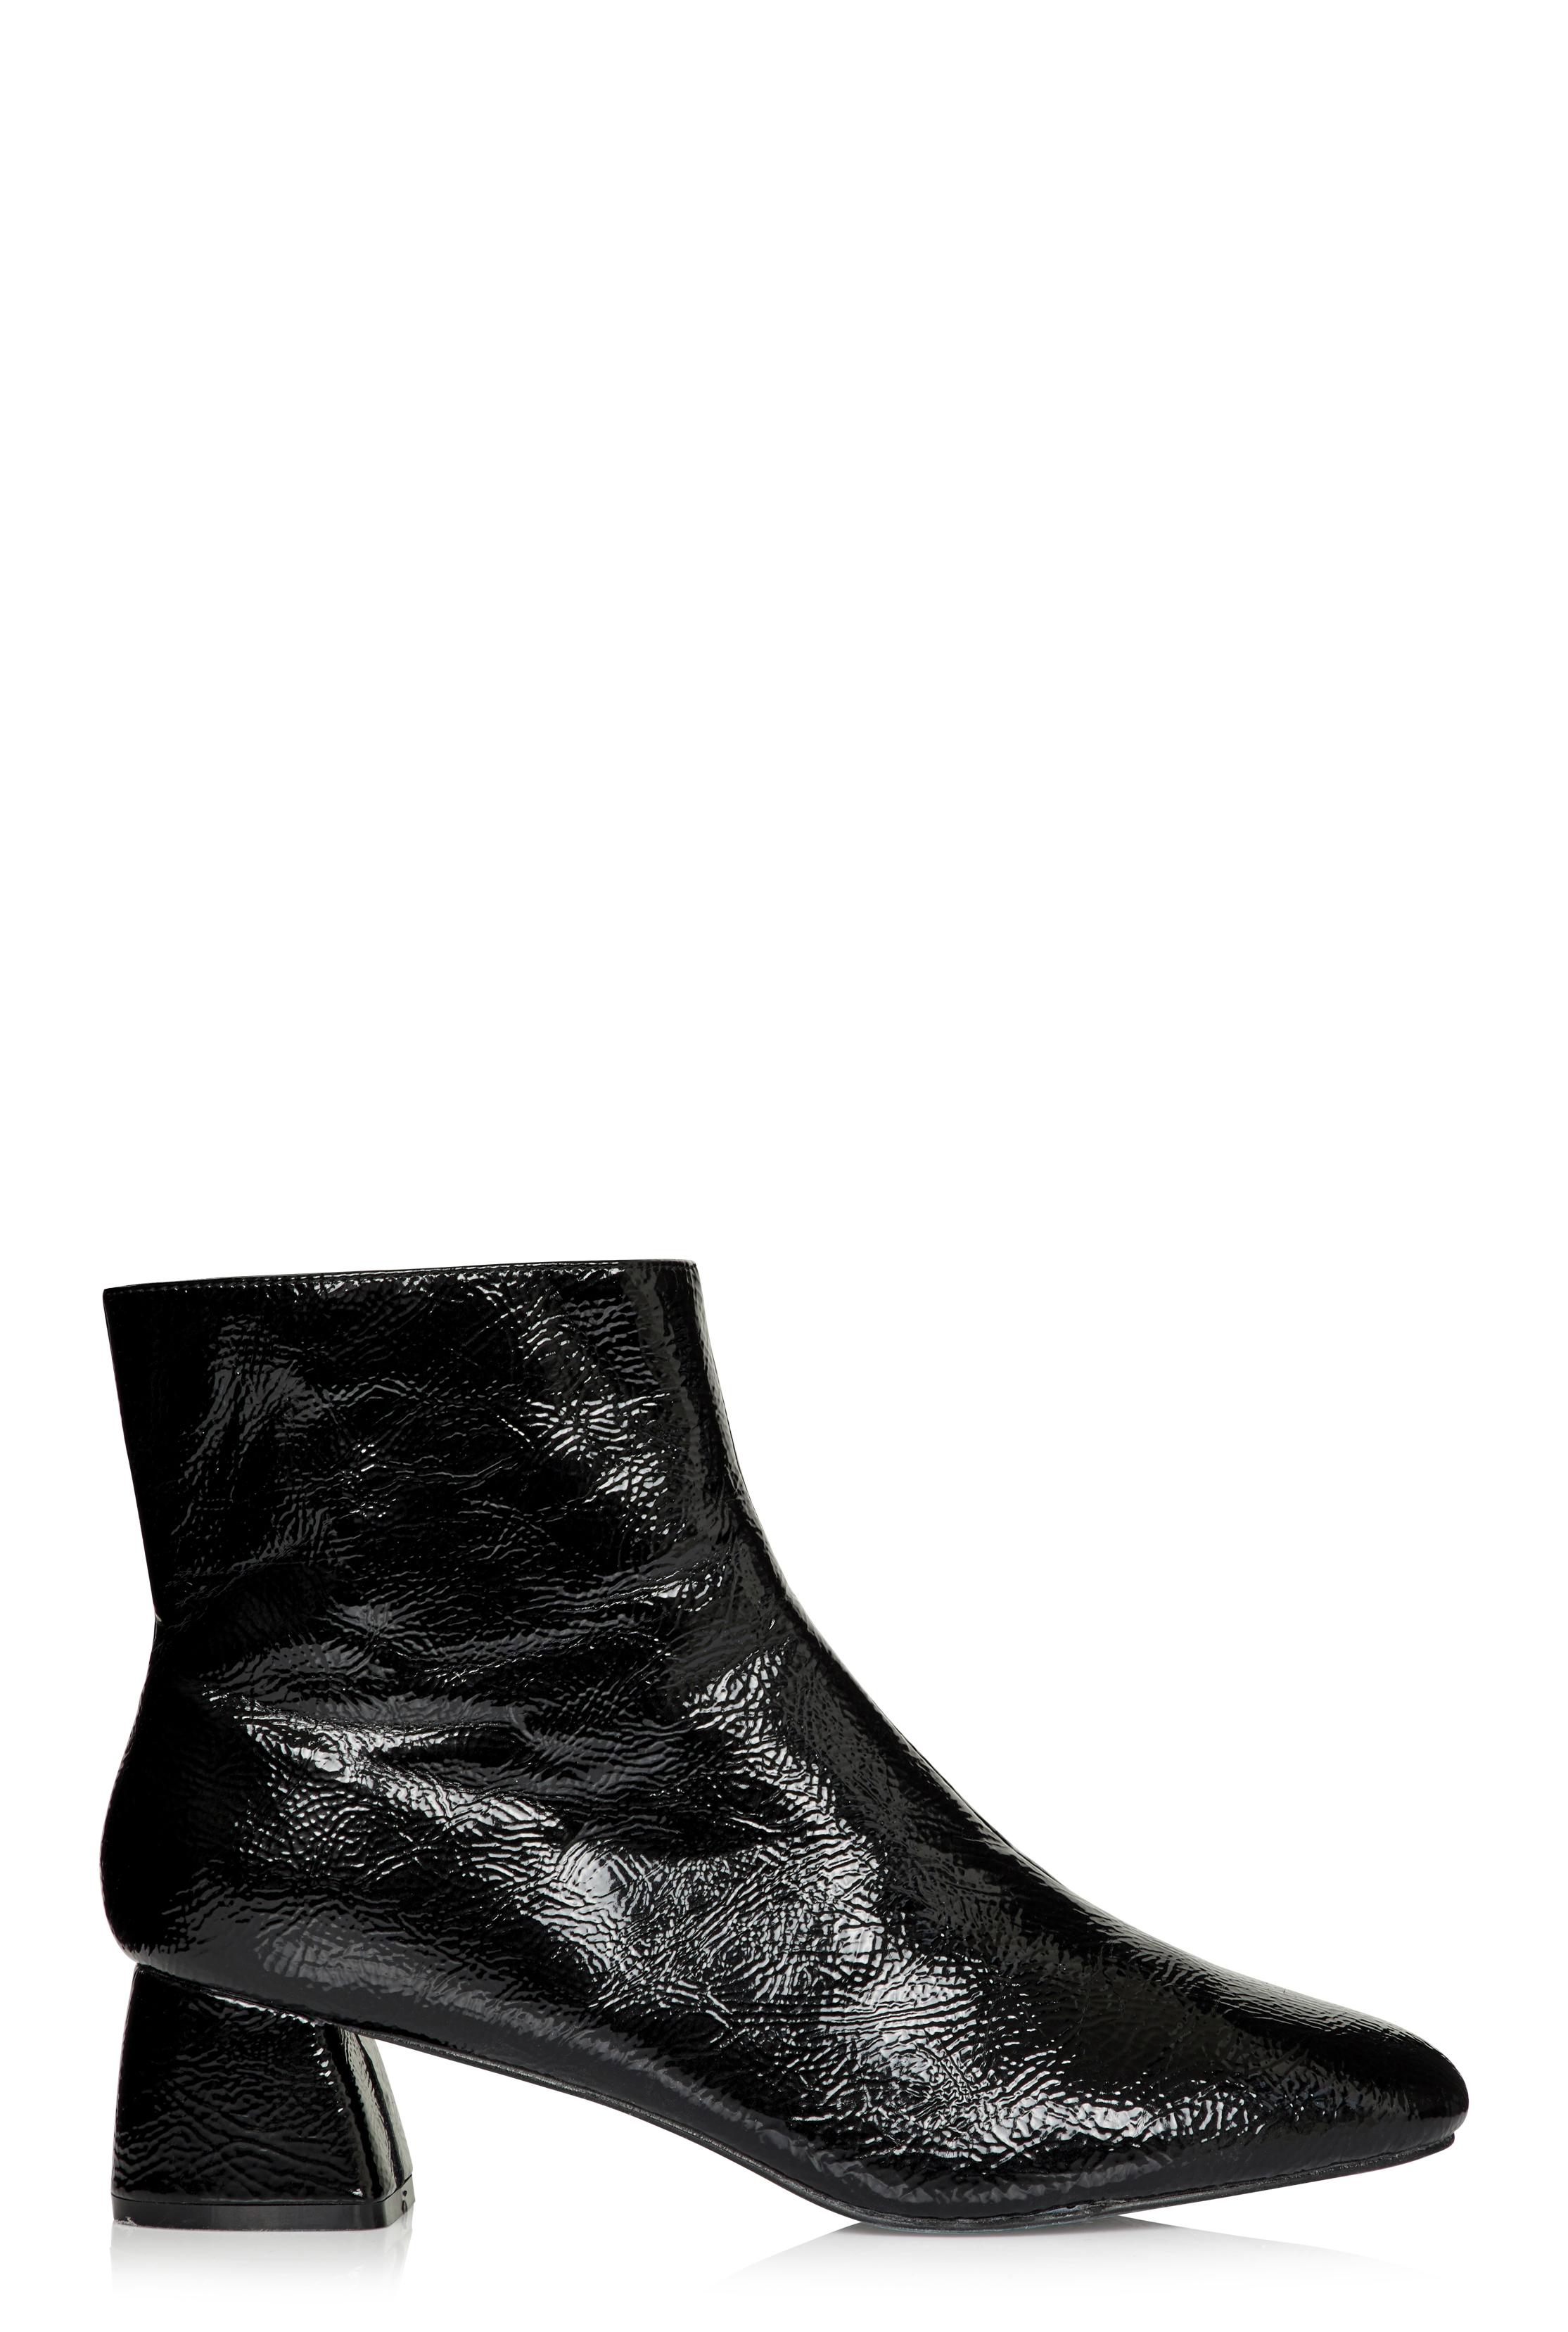 LTS Tatiana Patent Ankle Boot